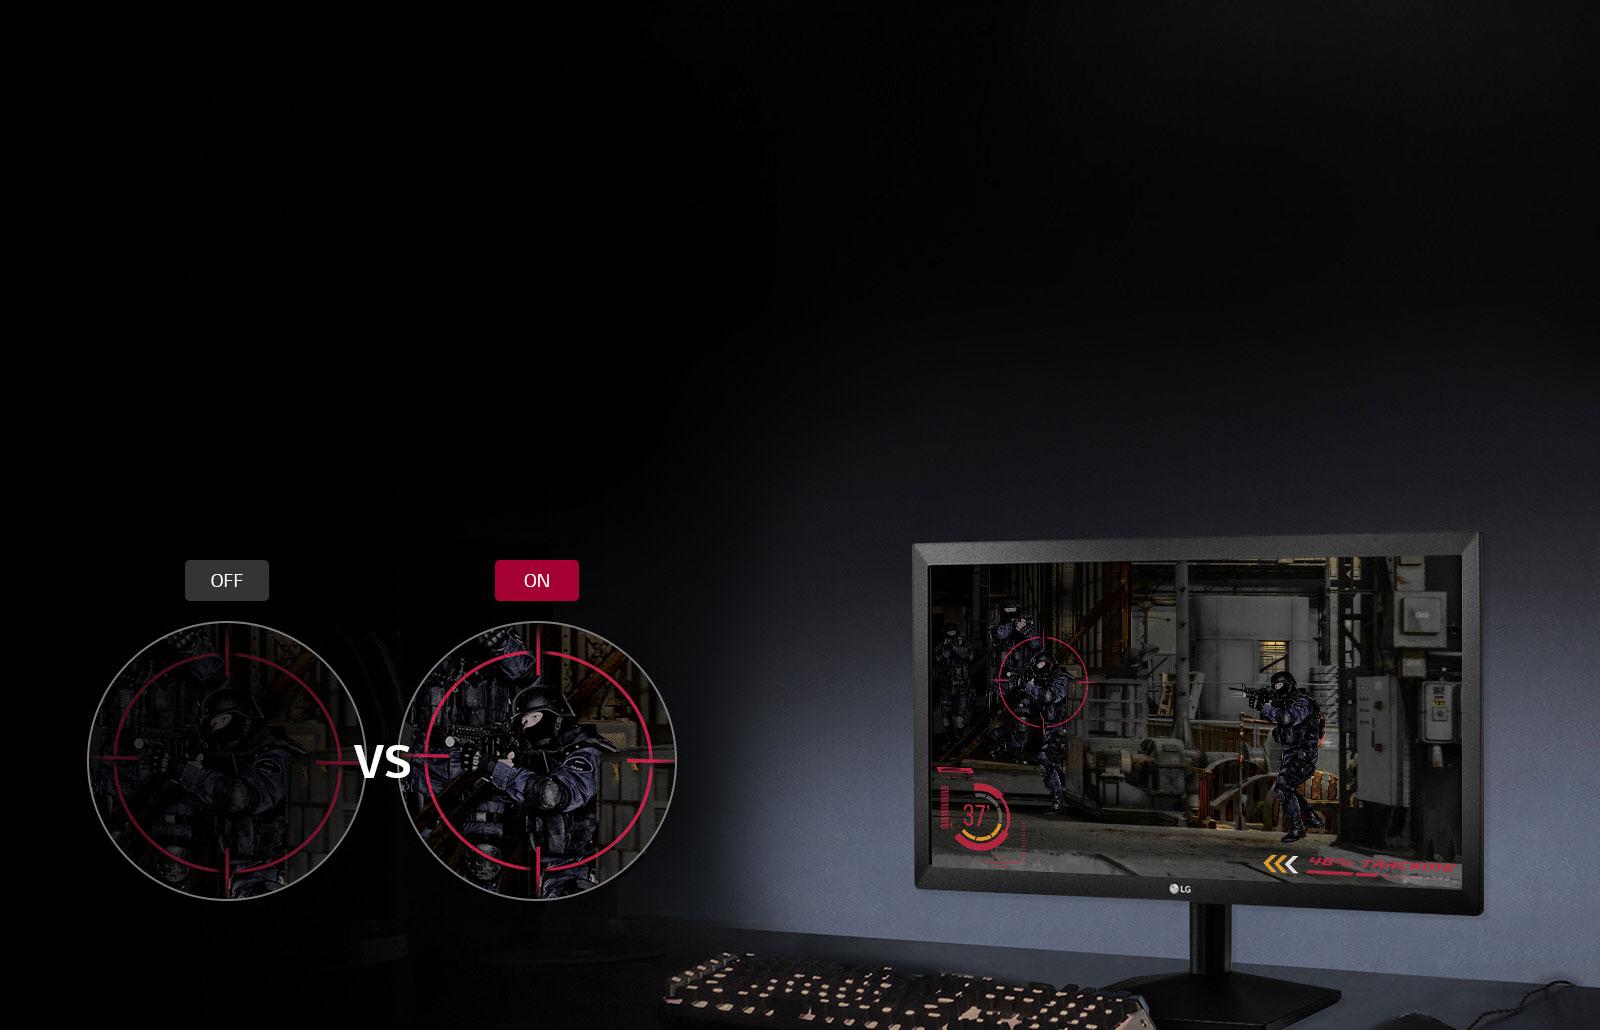 🦂 MONITOR LG FHD 22 PULGADAS ⚡ - productos-nuevos, pantallas, asys-computadores-asyscom - Global 20MK400 2018 Feature 04 BlackStabilizer D V1